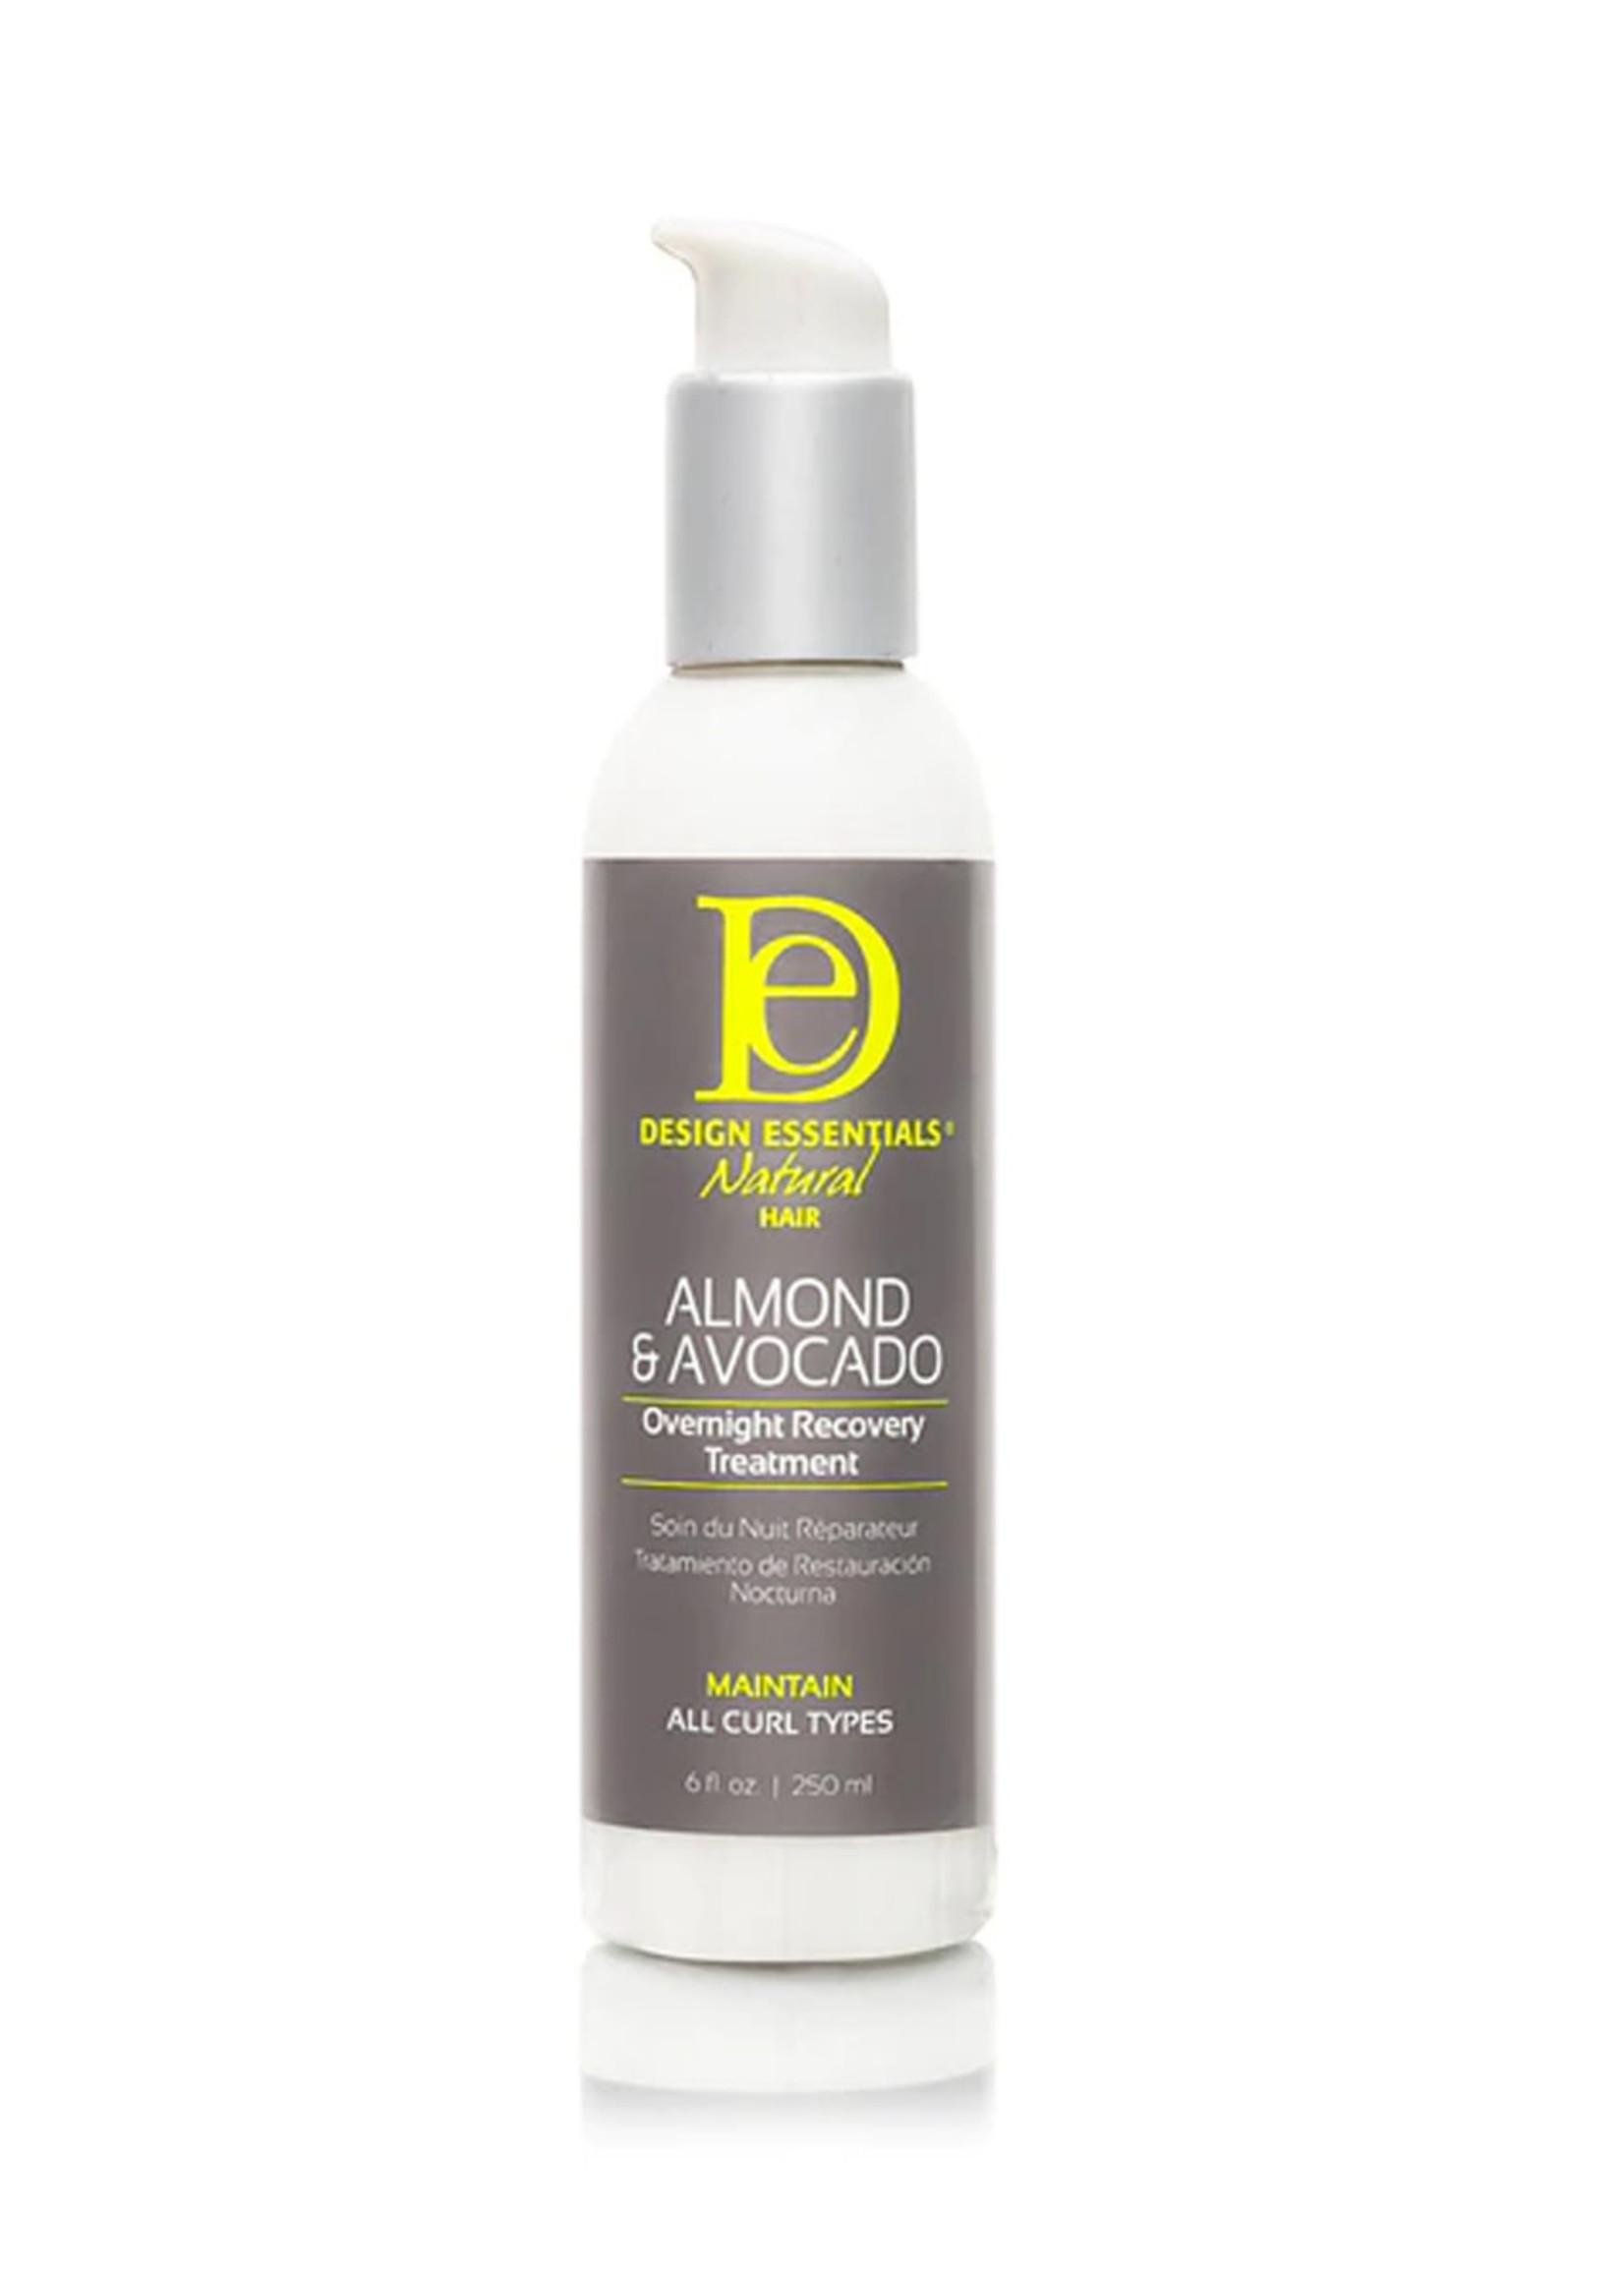 Design Essentials  Almond & Avocado Overnight Recovery Treatment